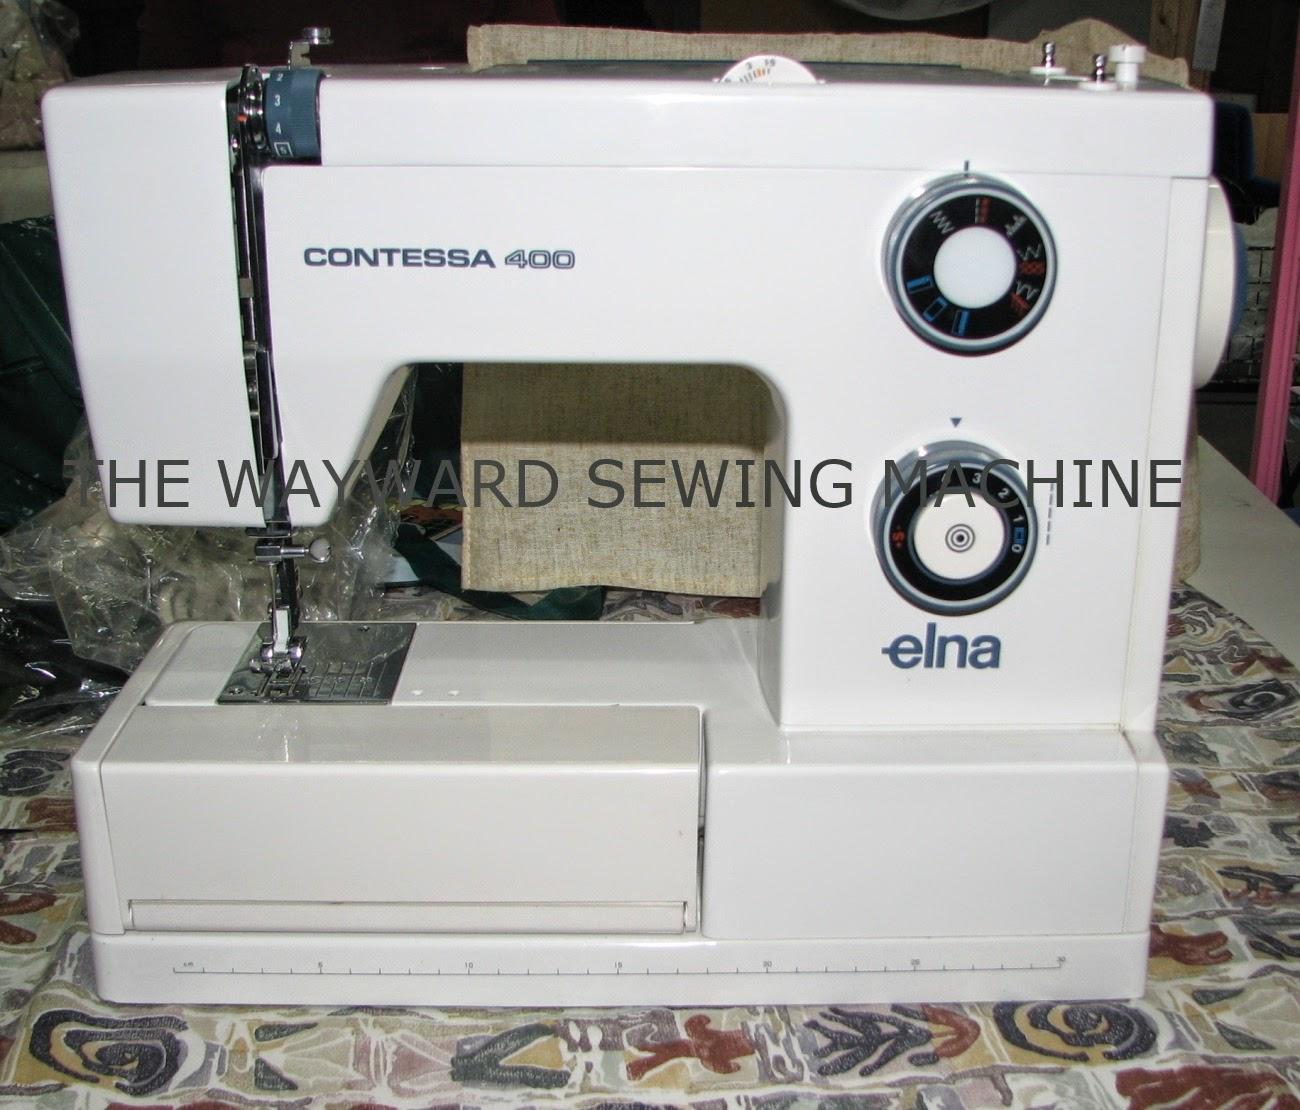 the wayward sewing machine elna contessa 400 rh waywardsewingmachine blogspot com